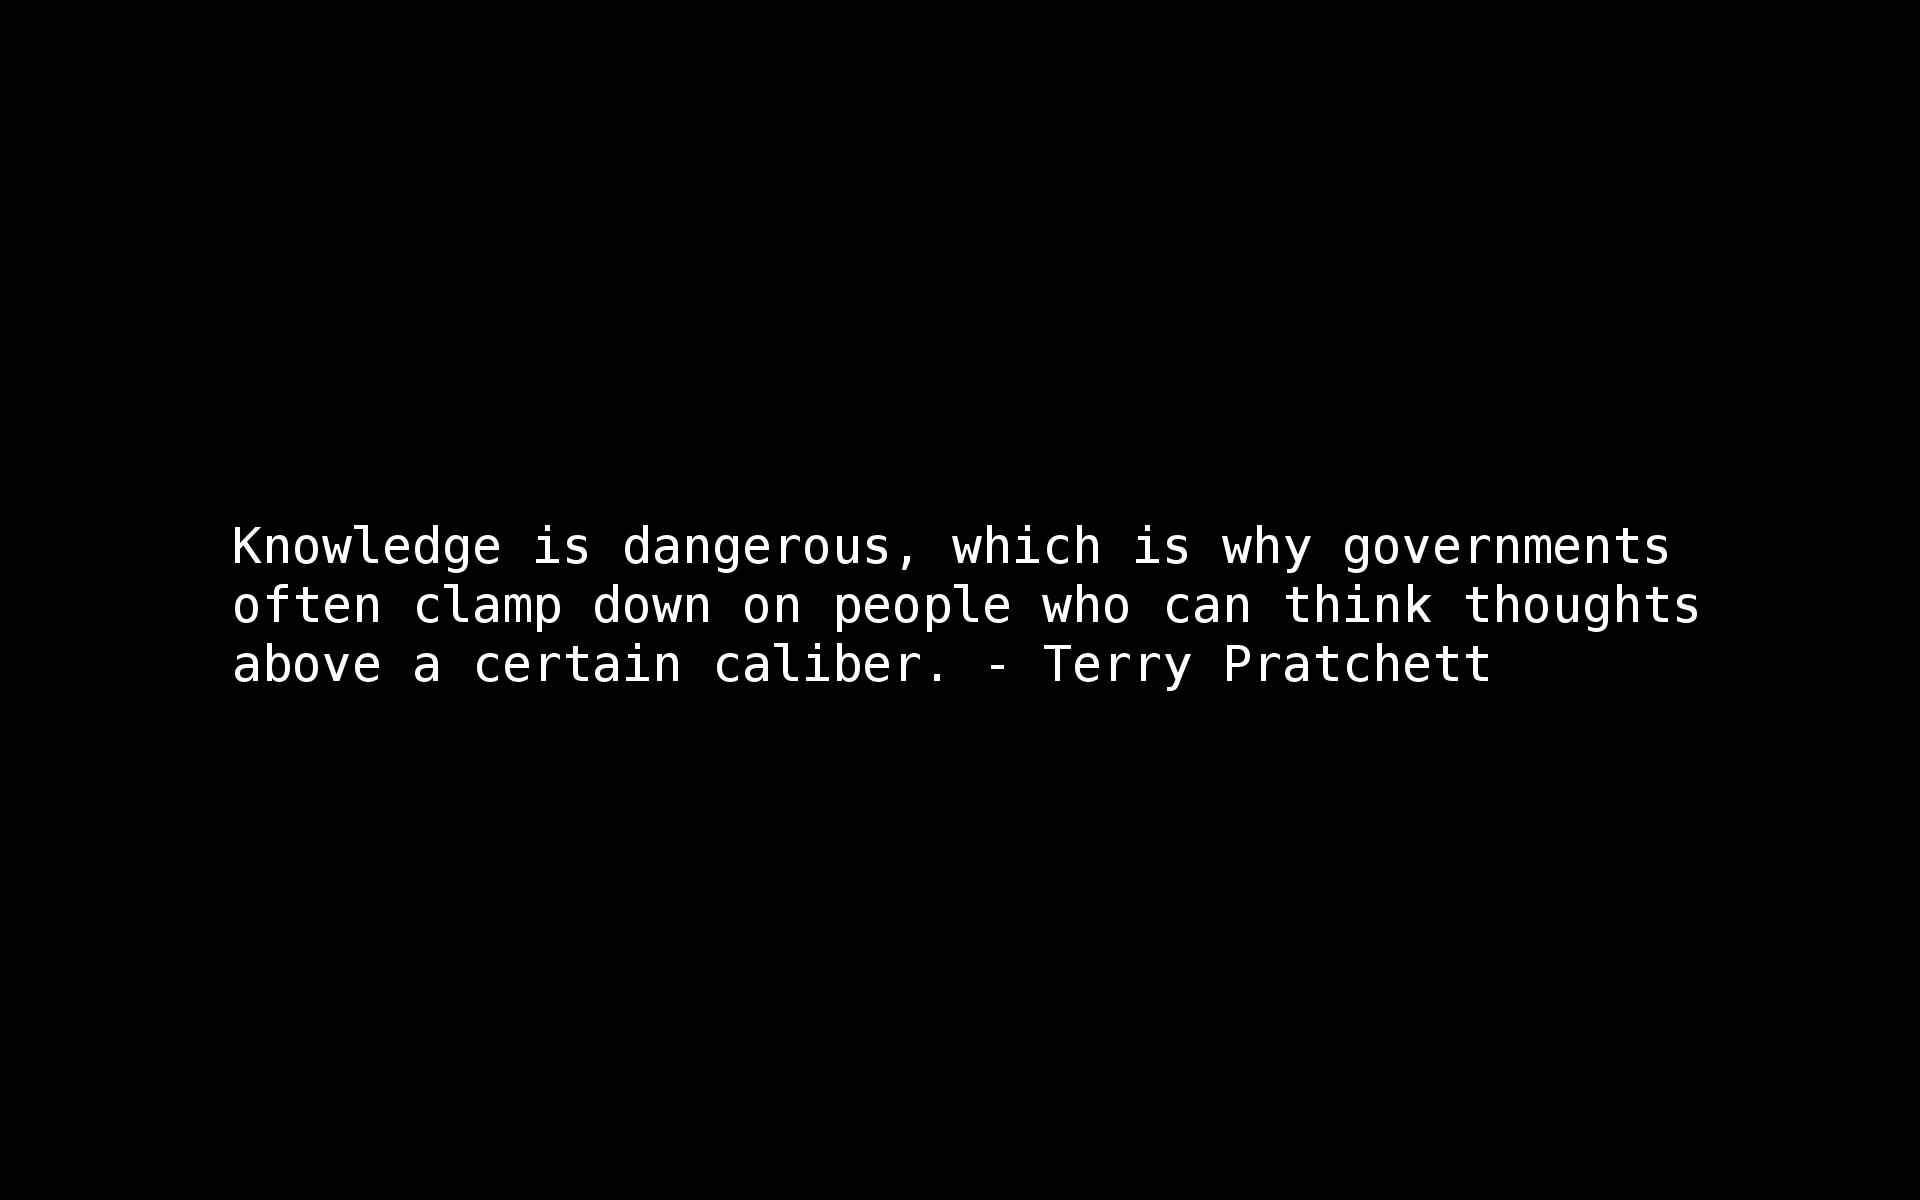 Terry Prachett's quote #1